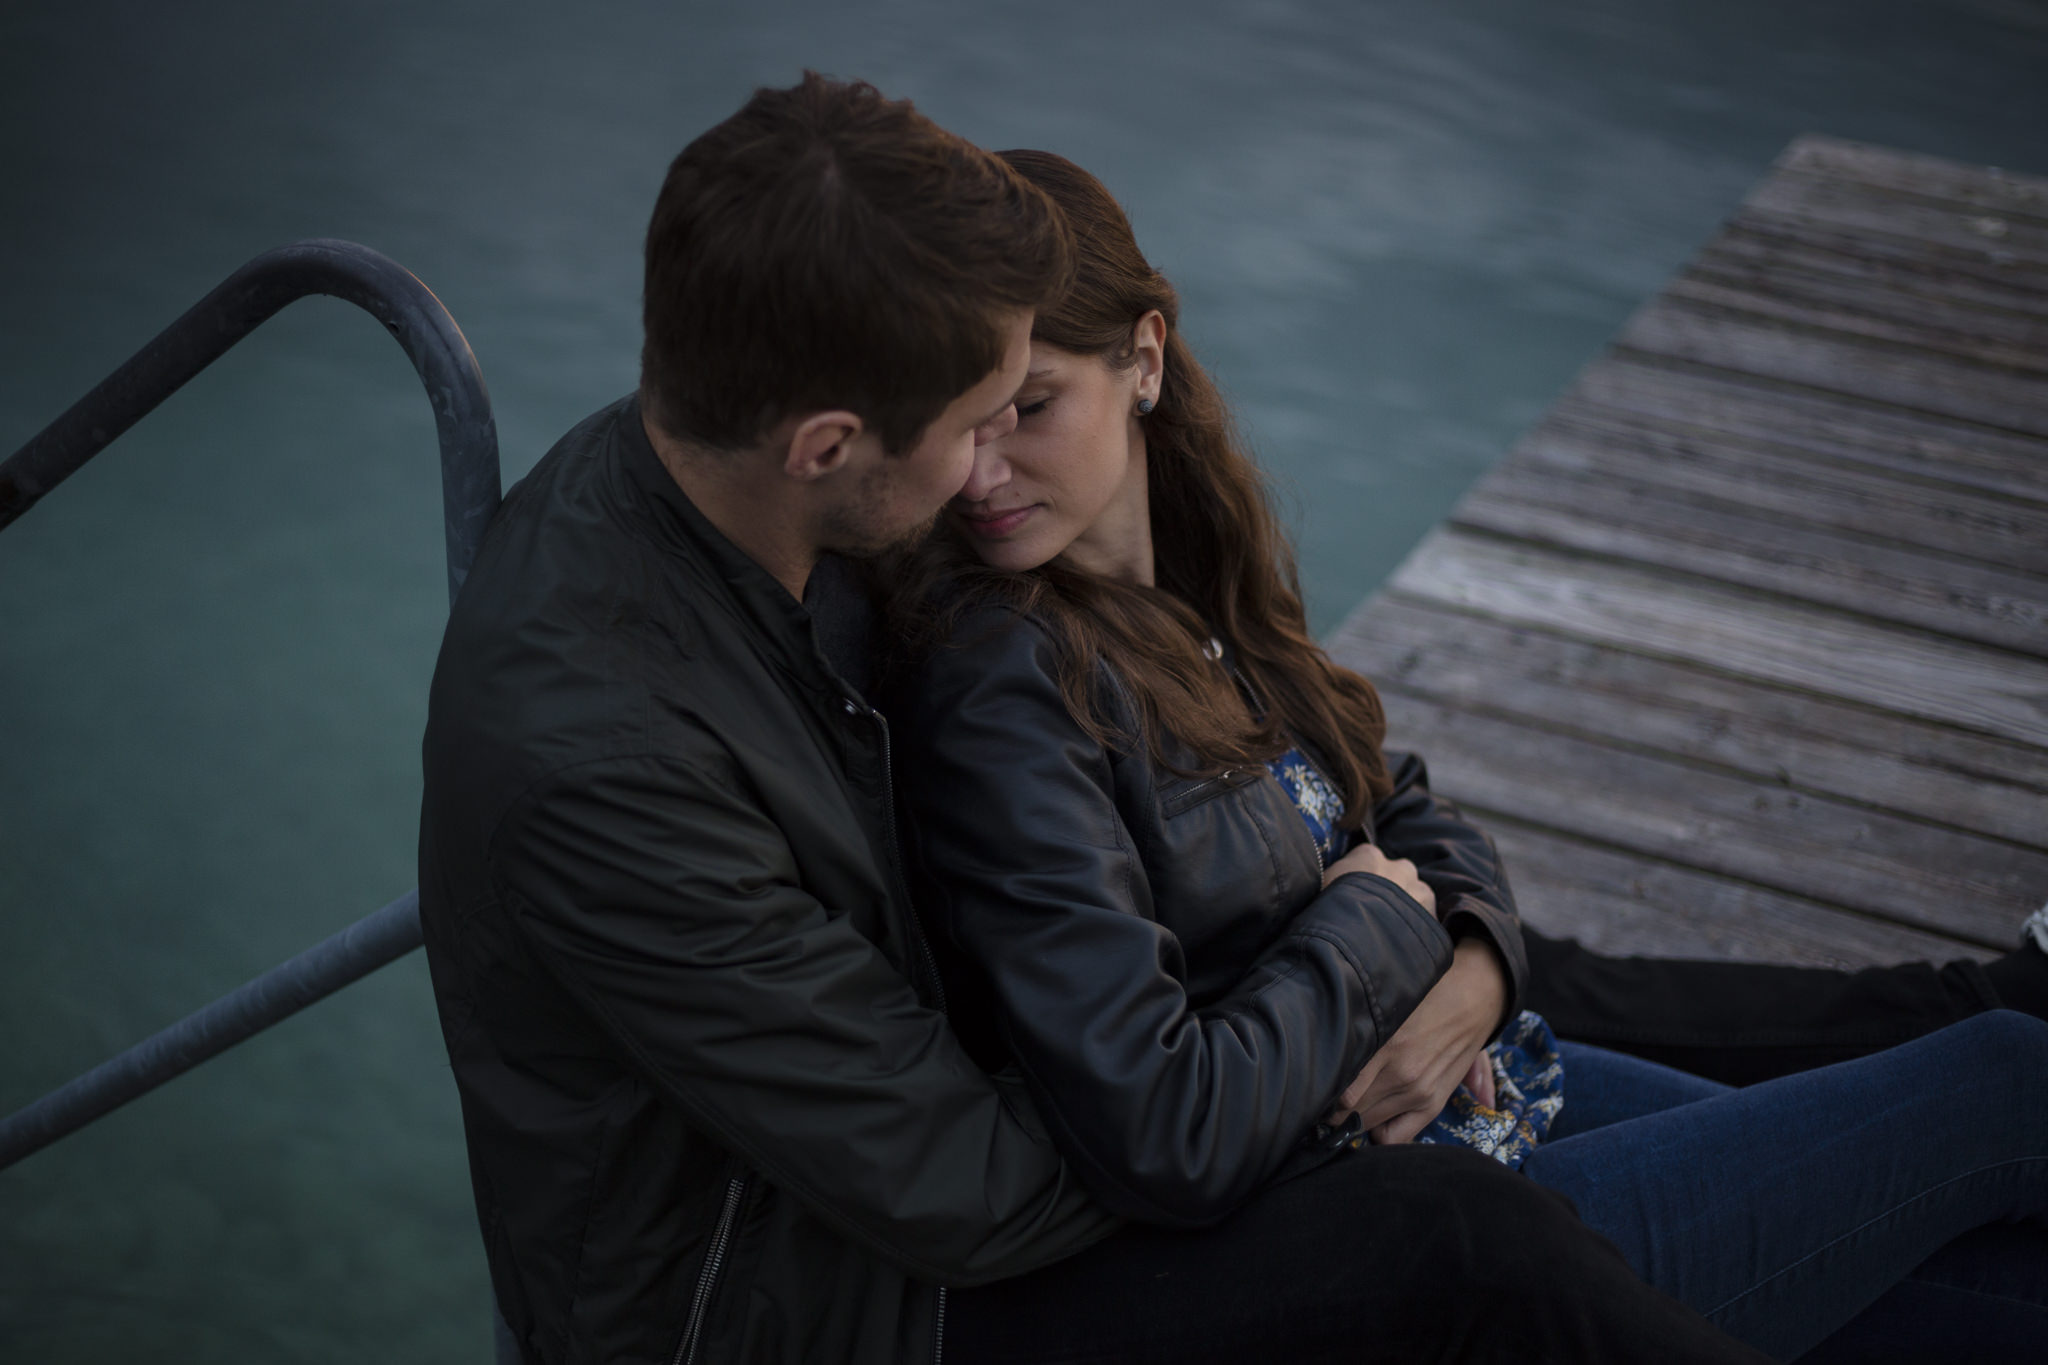 Bianca&Andy_046.jpg